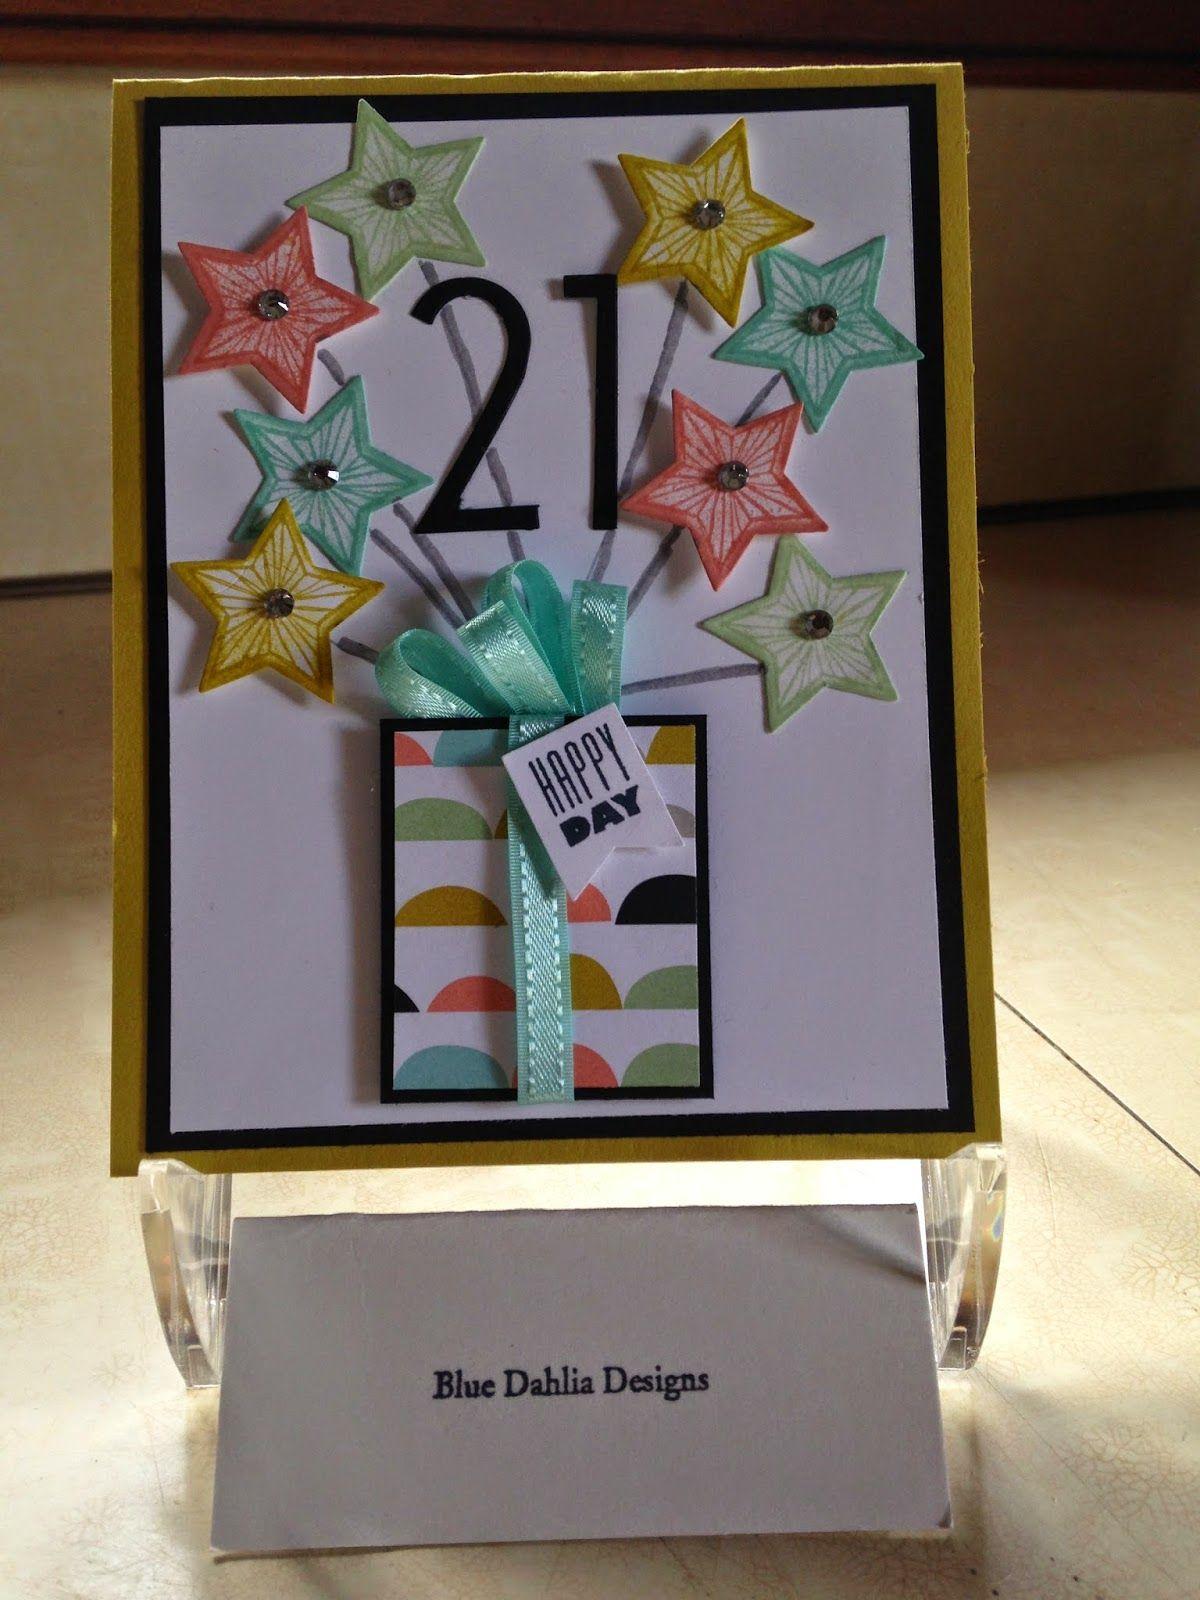 Blue Dahlia Designs Happy 21st Birthday Rachel Birthday Cards Special Birthday Cards 21st Birthday Cards